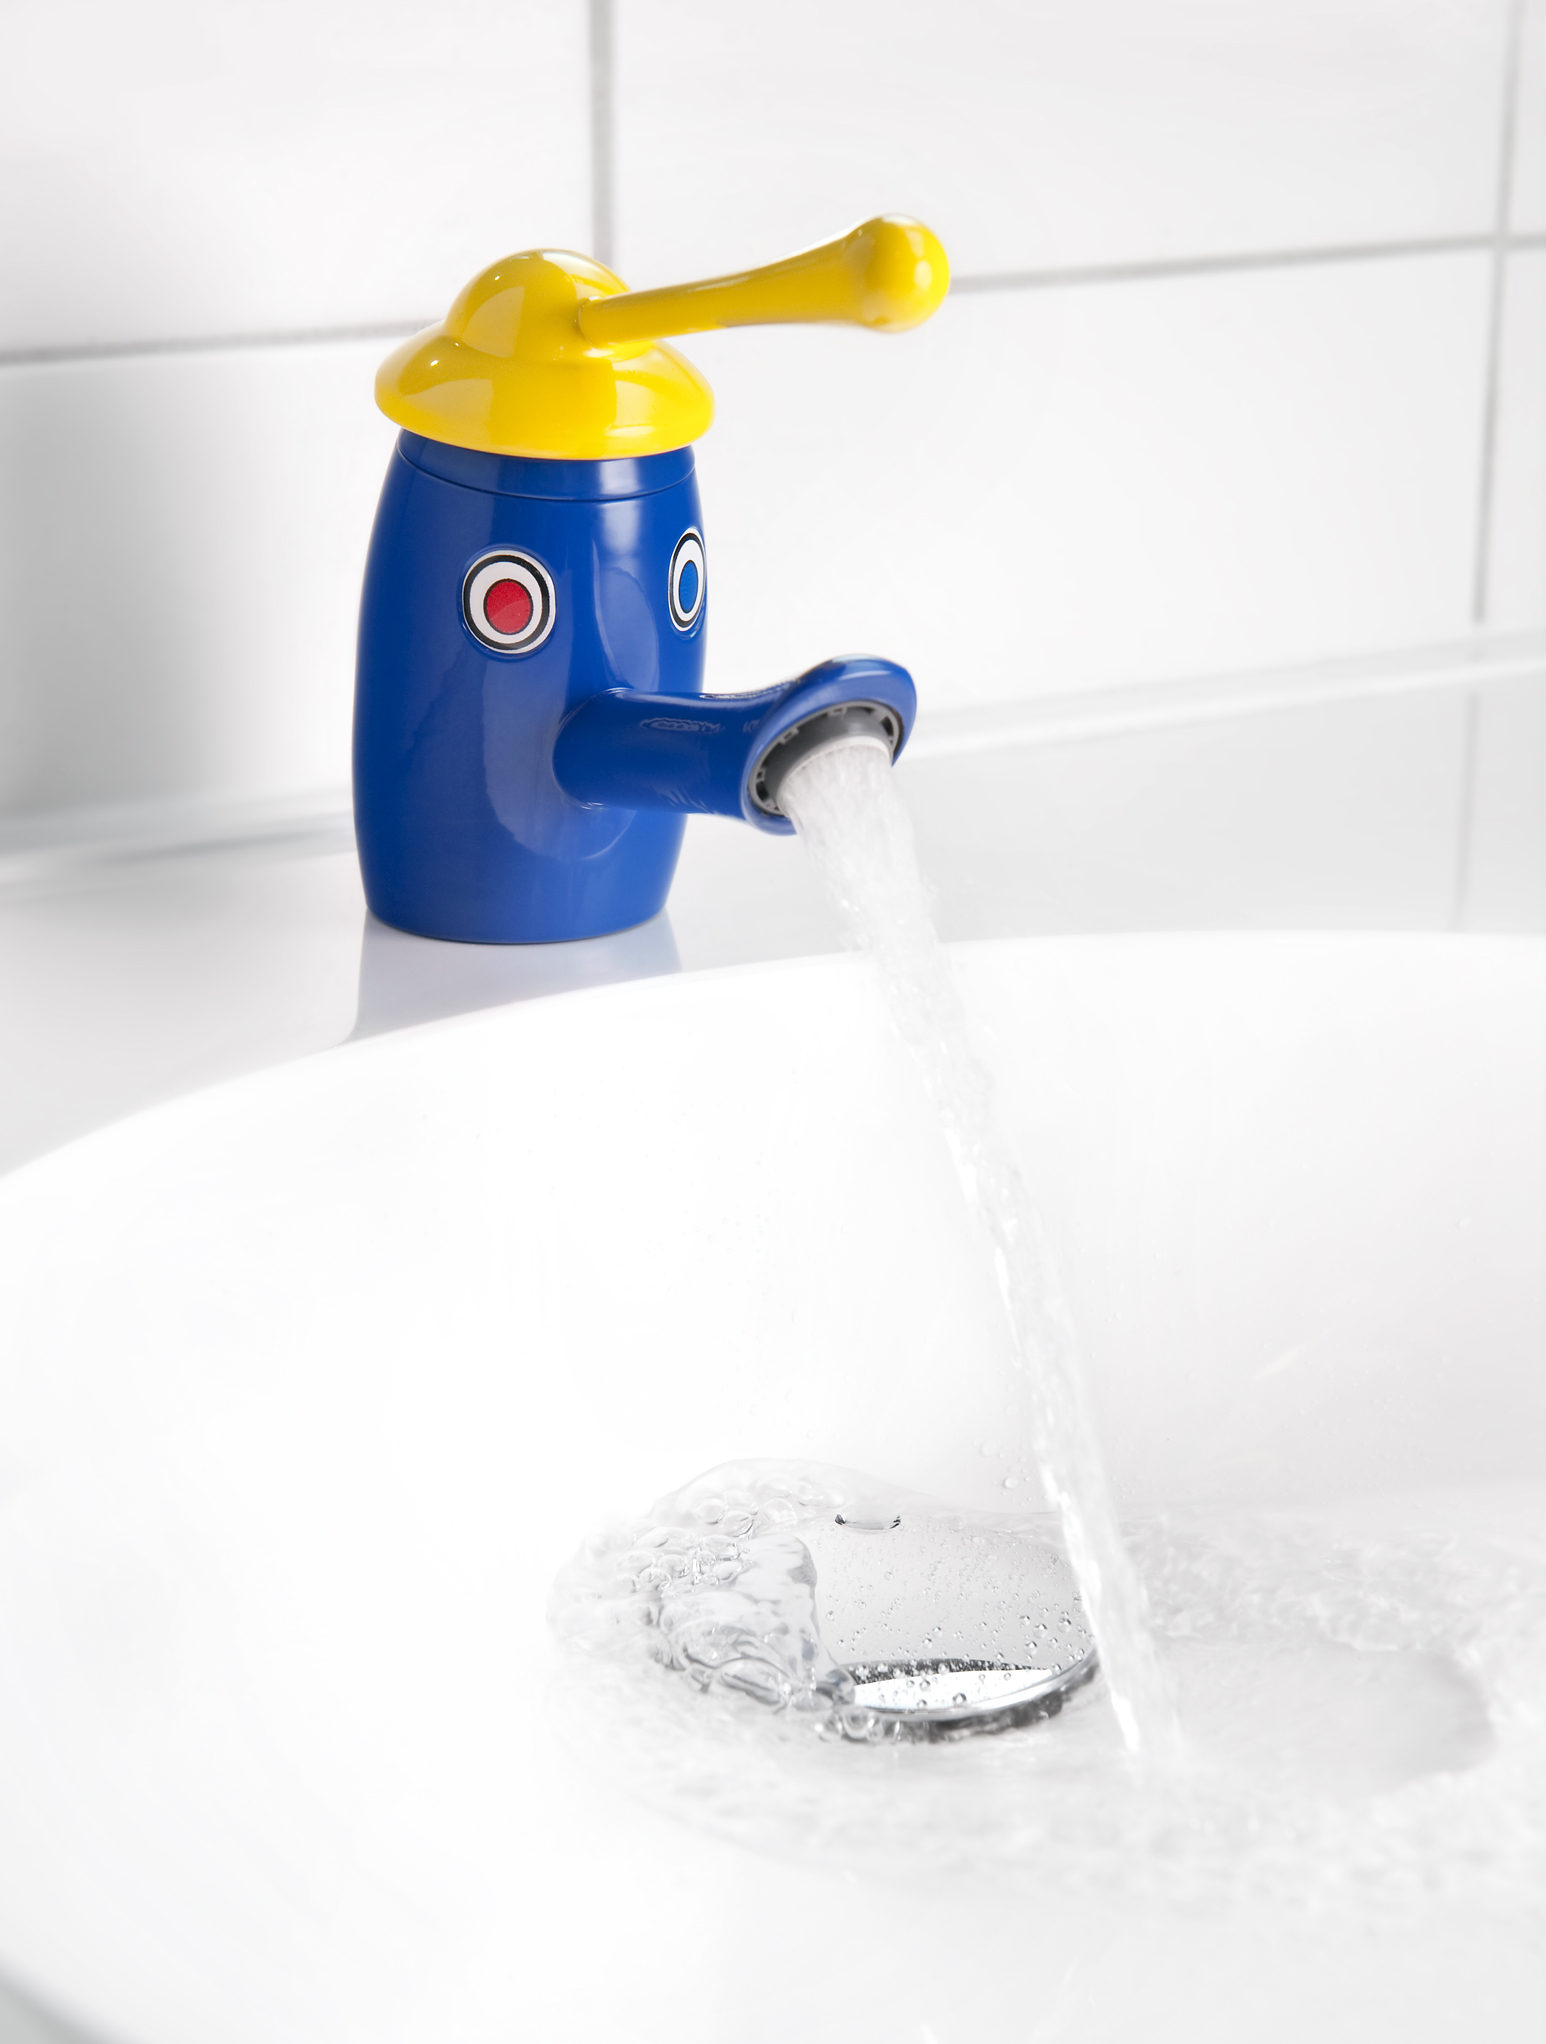 WASHINO und AQUAPINO spielen mit Franke Aquarotter GmbH